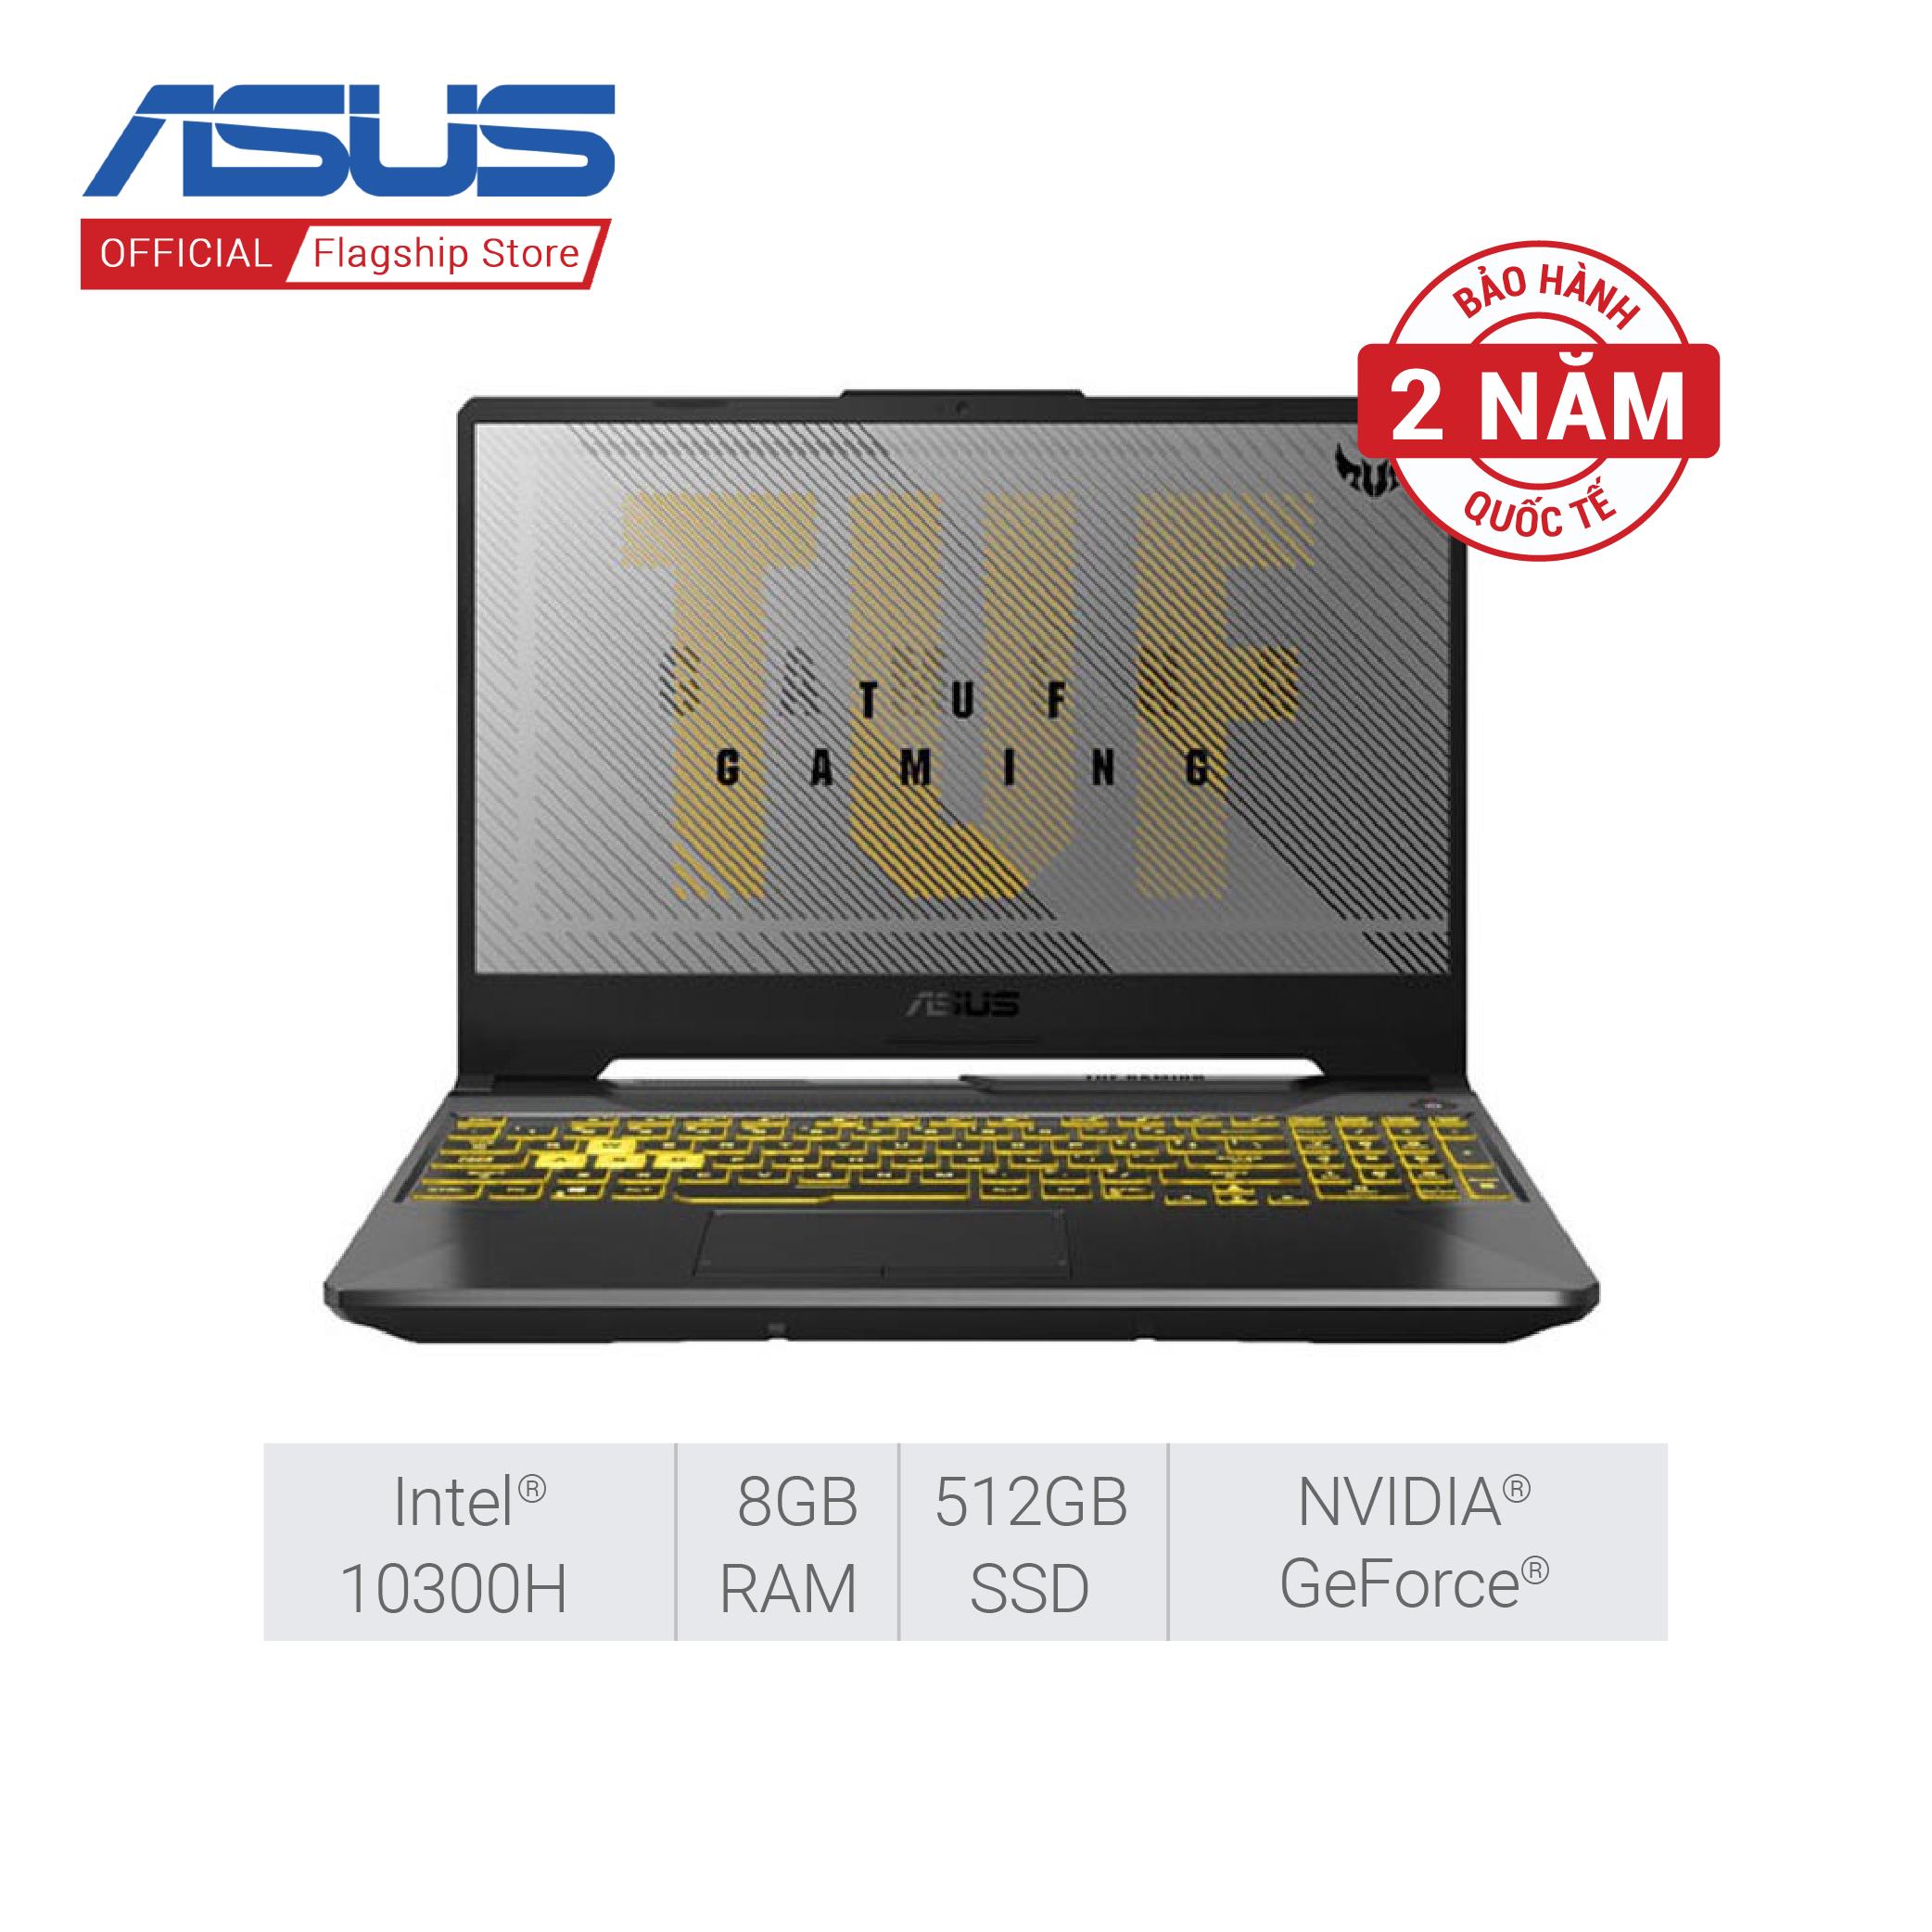 [SUPER SALE 21.09] Laptop Asus TUF FX506LH-HN002T (Core i5-10300H/8GB RAM/ 512GB SSD/15.6-inch FHD/WIN 10)